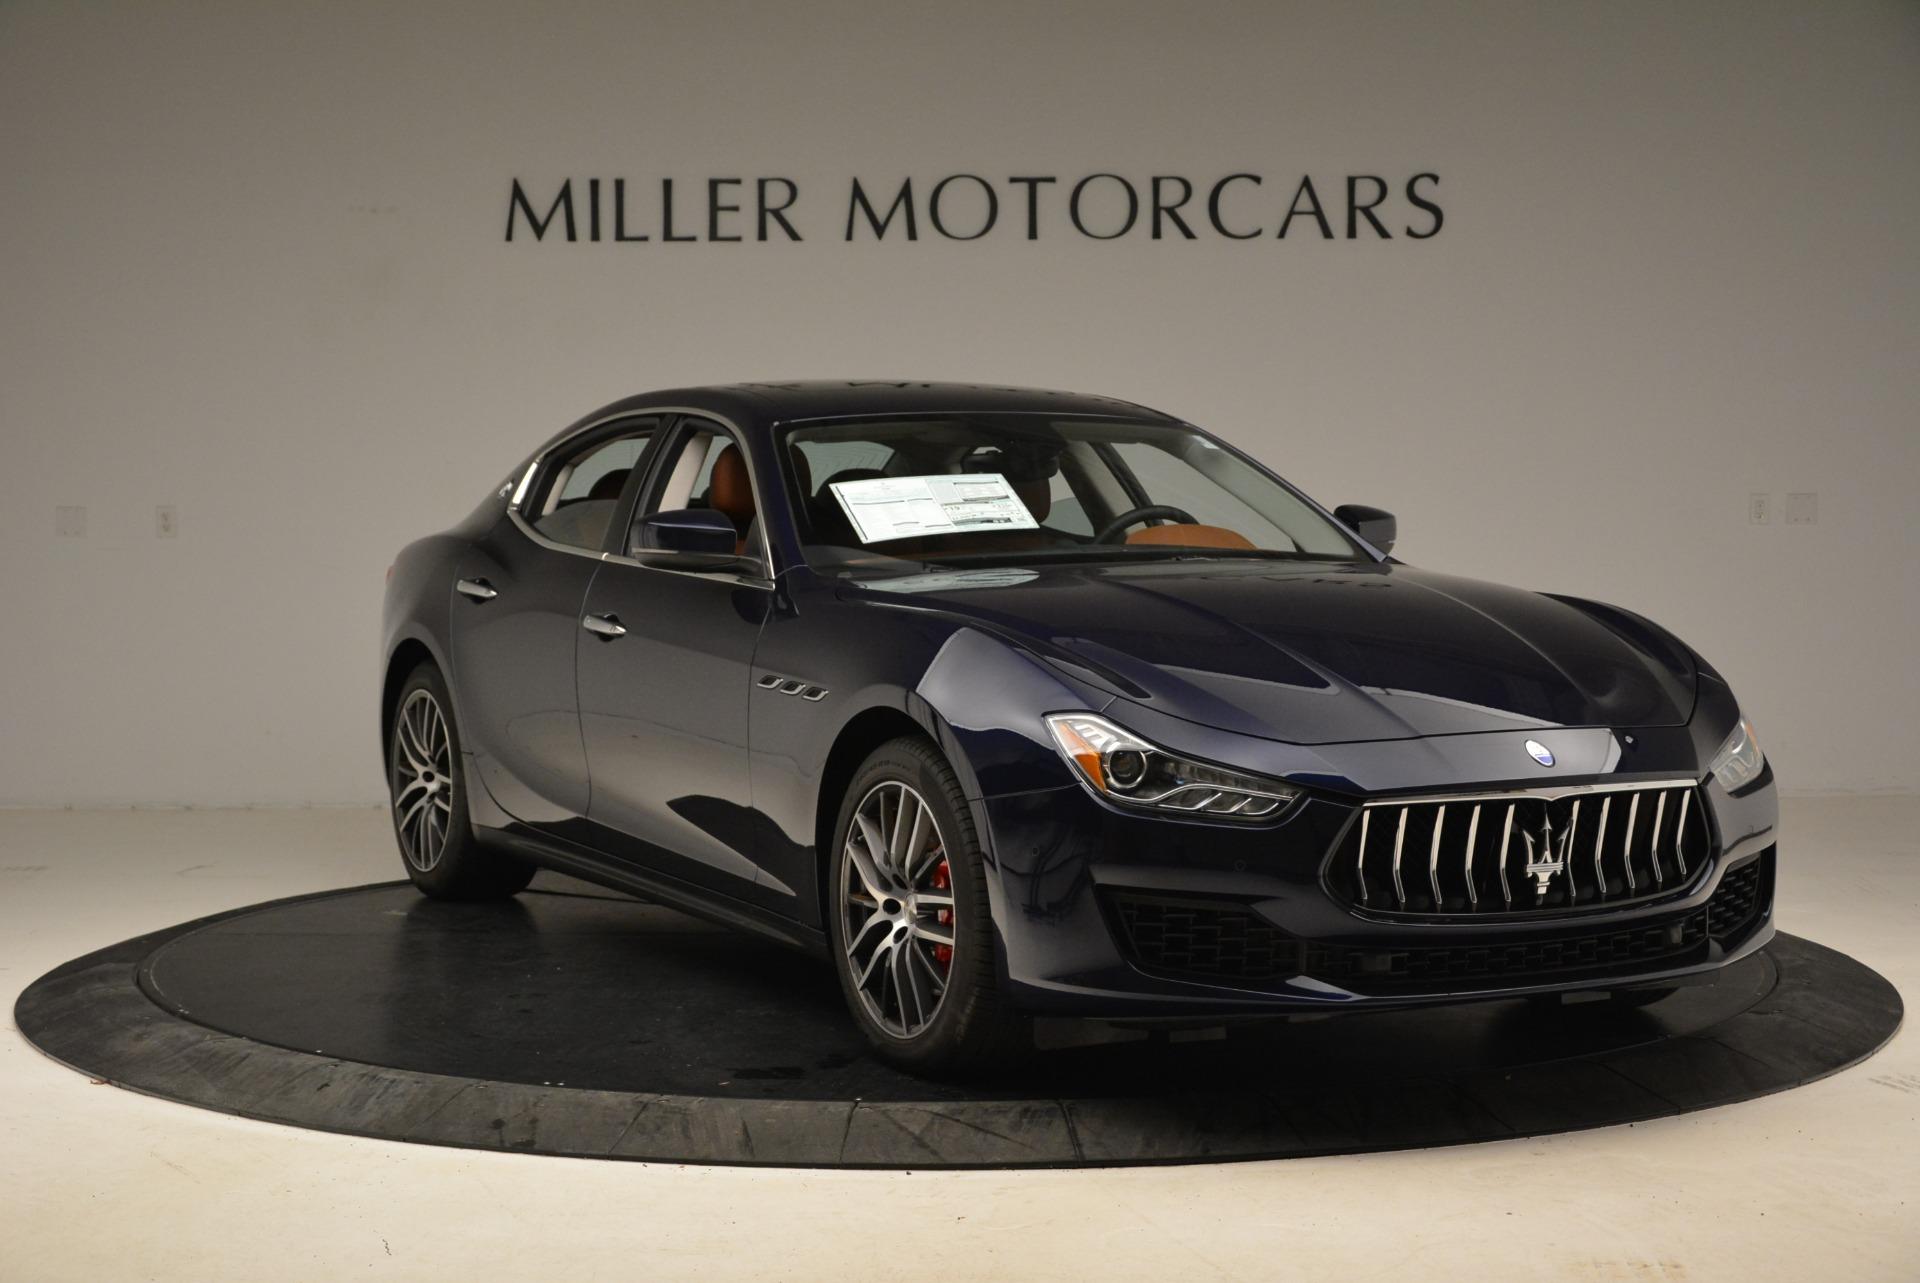 New 2019 Maserati Ghibli S Q4 For Sale In Westport, CT 3035_p11